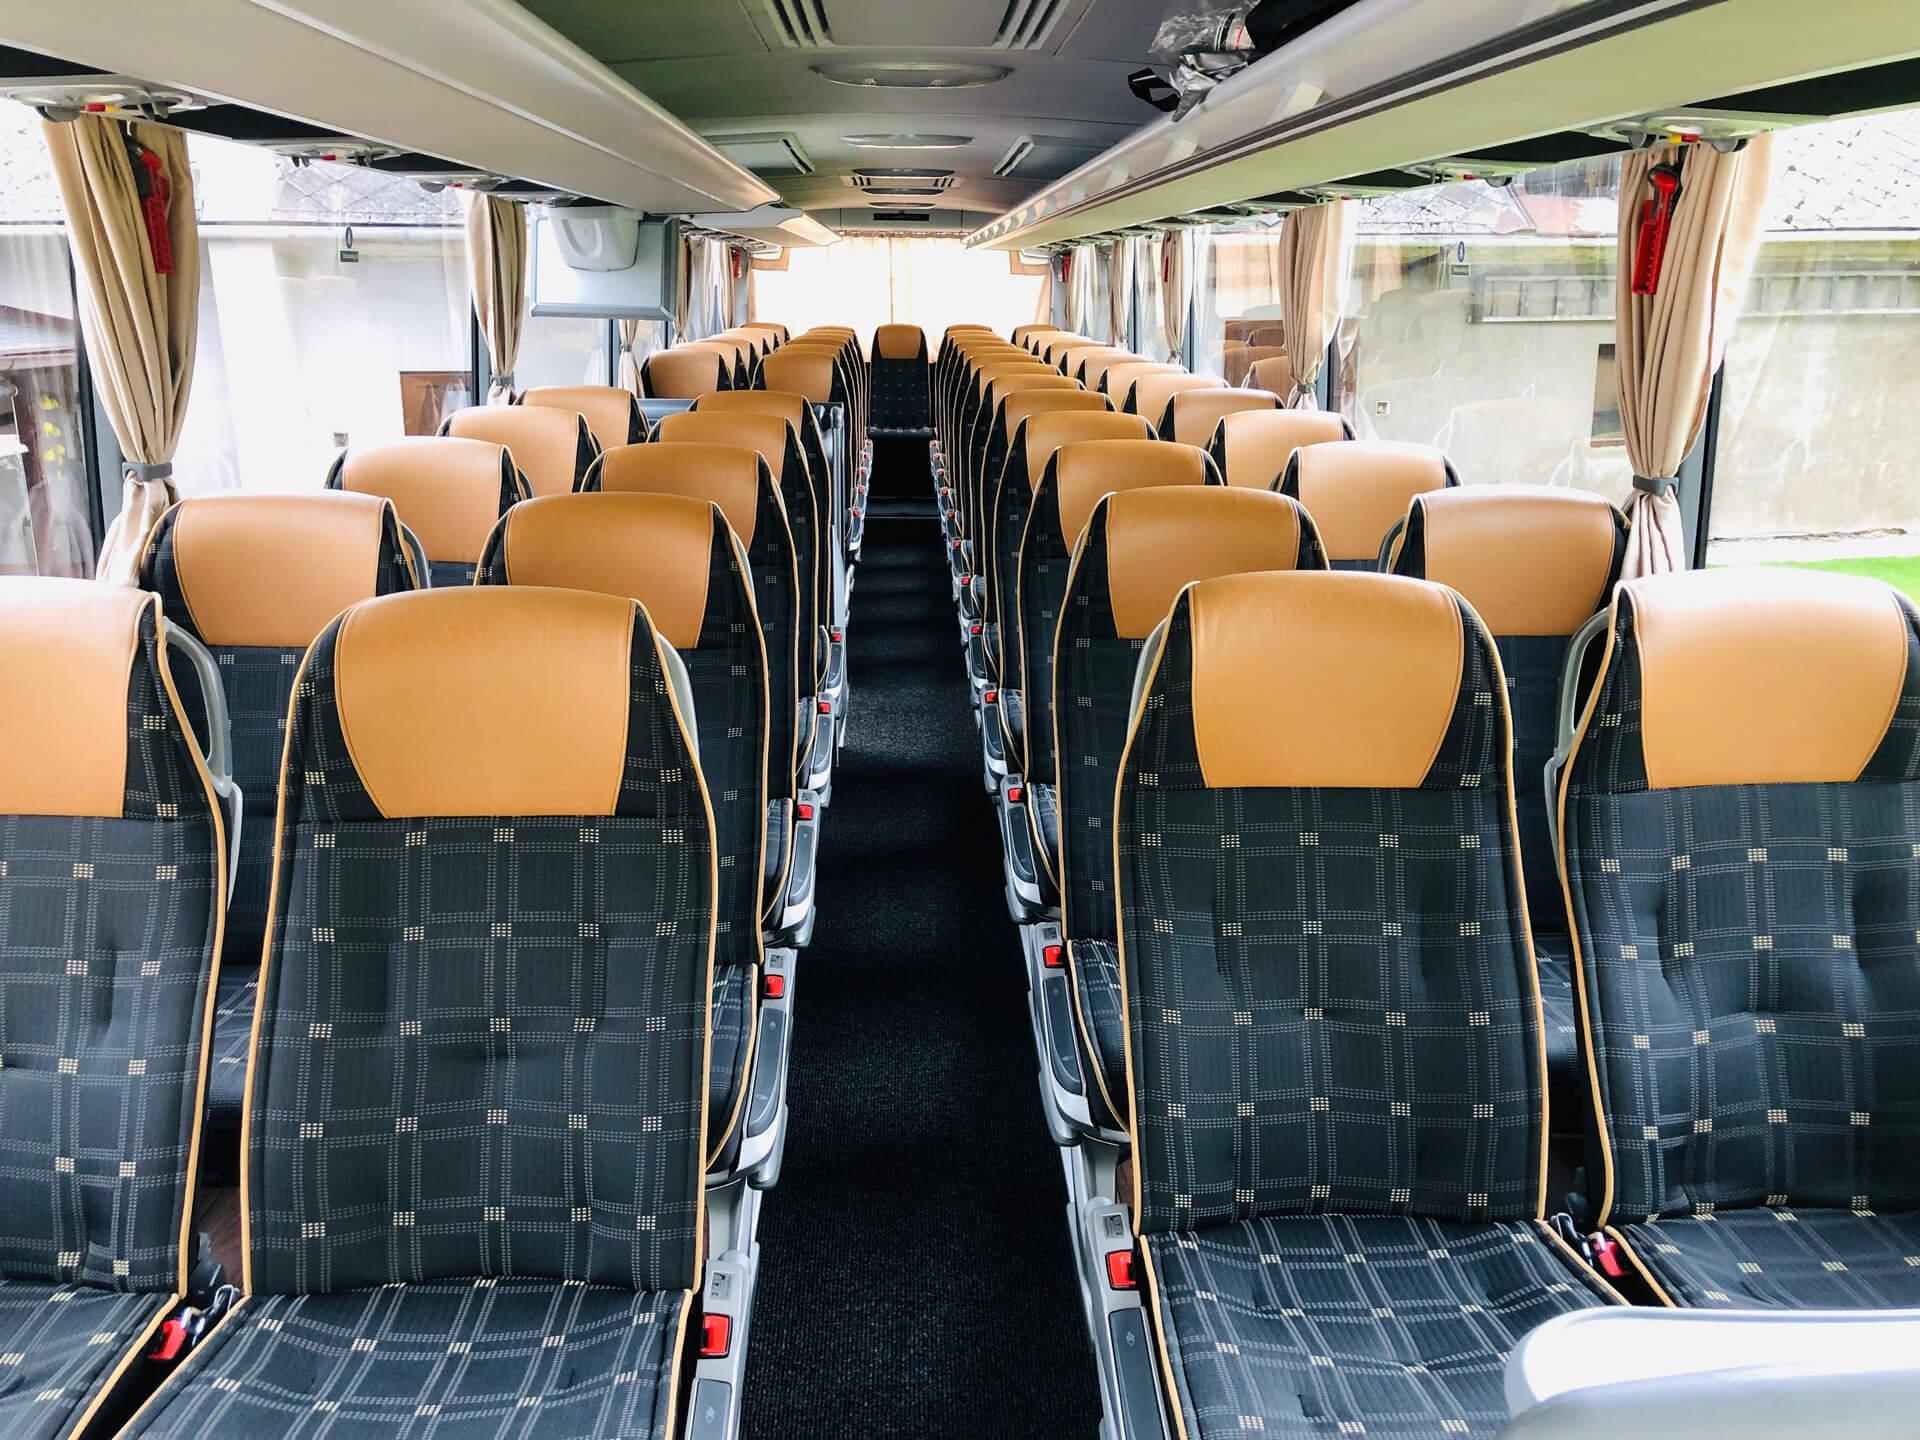 Medzinárodná autobusová doprava ŠOLTÉS TRAVEL